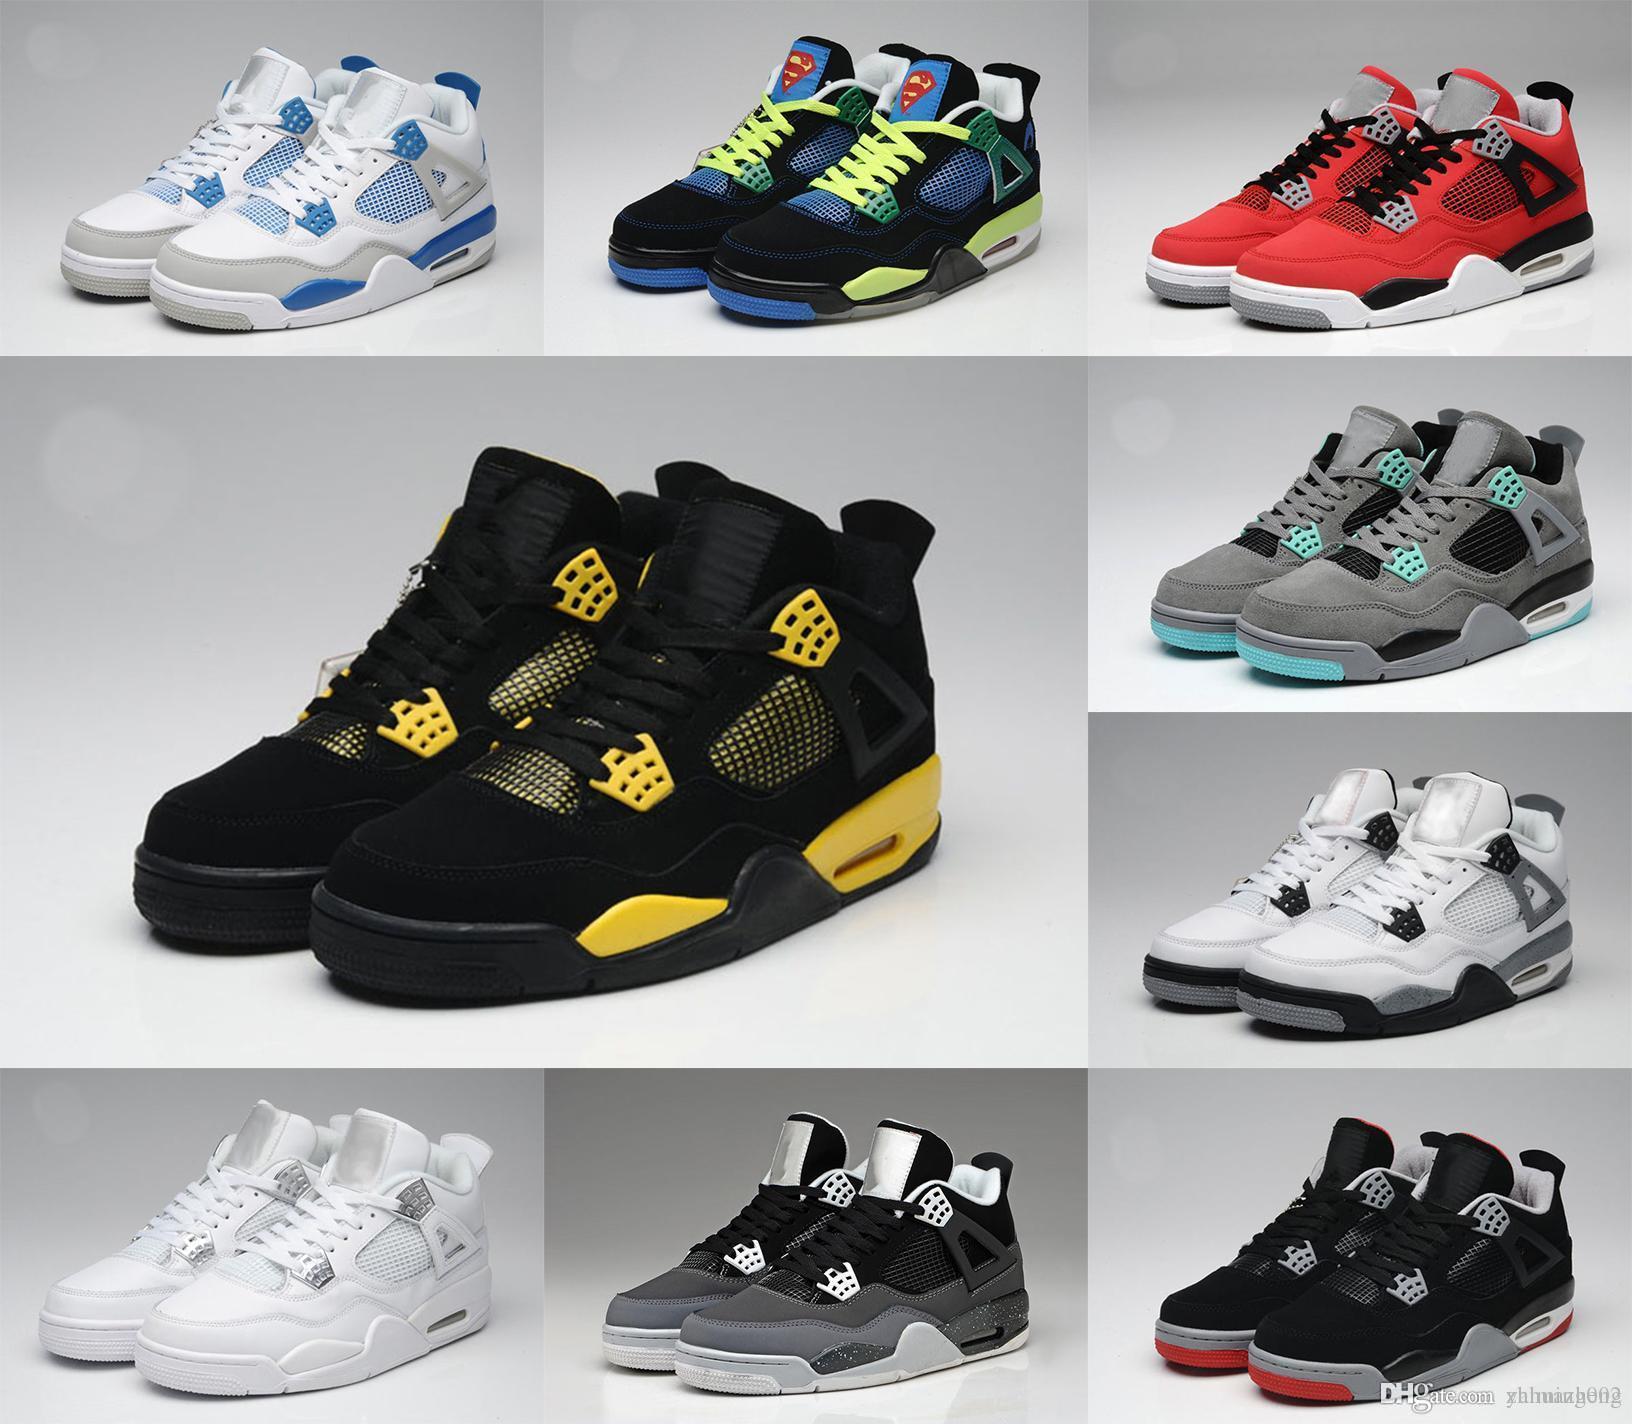 size 40 1ee44 0cd76 Großhandel 2018 Bred Toro Bravo 4 Feuer Rot Schwarz Rot Männer Casual  Basketballschuhe 4 S 13 Farbe Top Qualität 8 13 Nike Air Jordan Jordans  Retro Retros ...